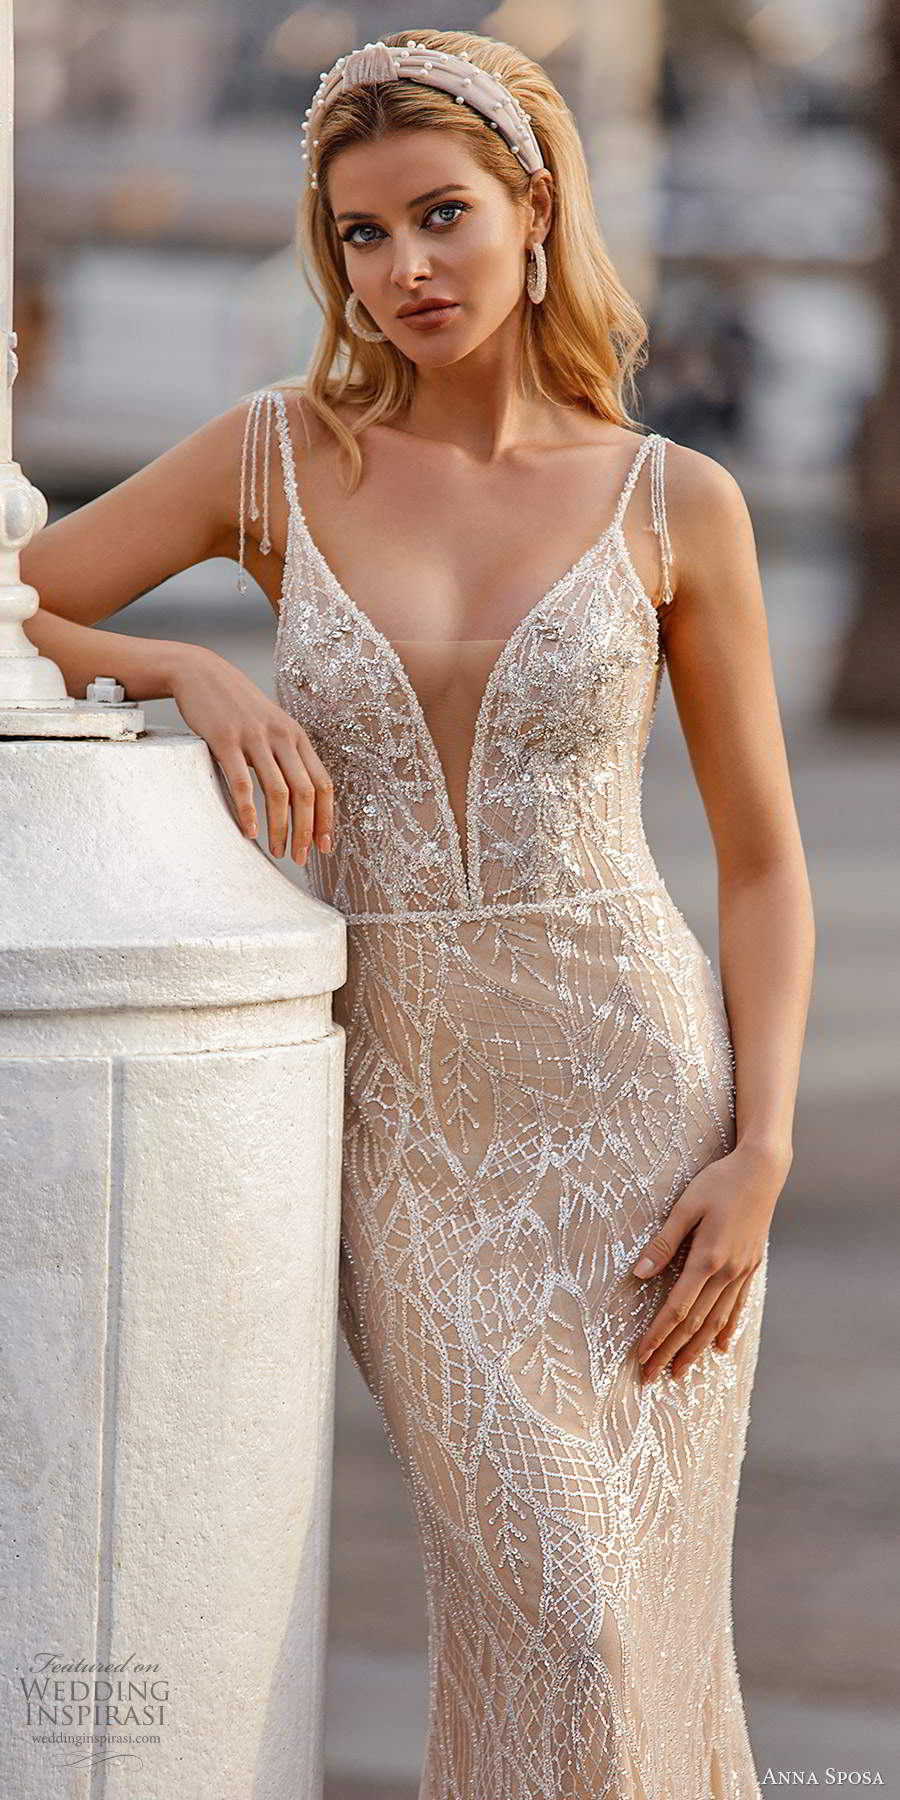 anna sposa 2021 bridal sleeveless beaded straps plunging v neckline fully embellished sheath wedding dress oatmeal sweep train (7) mv